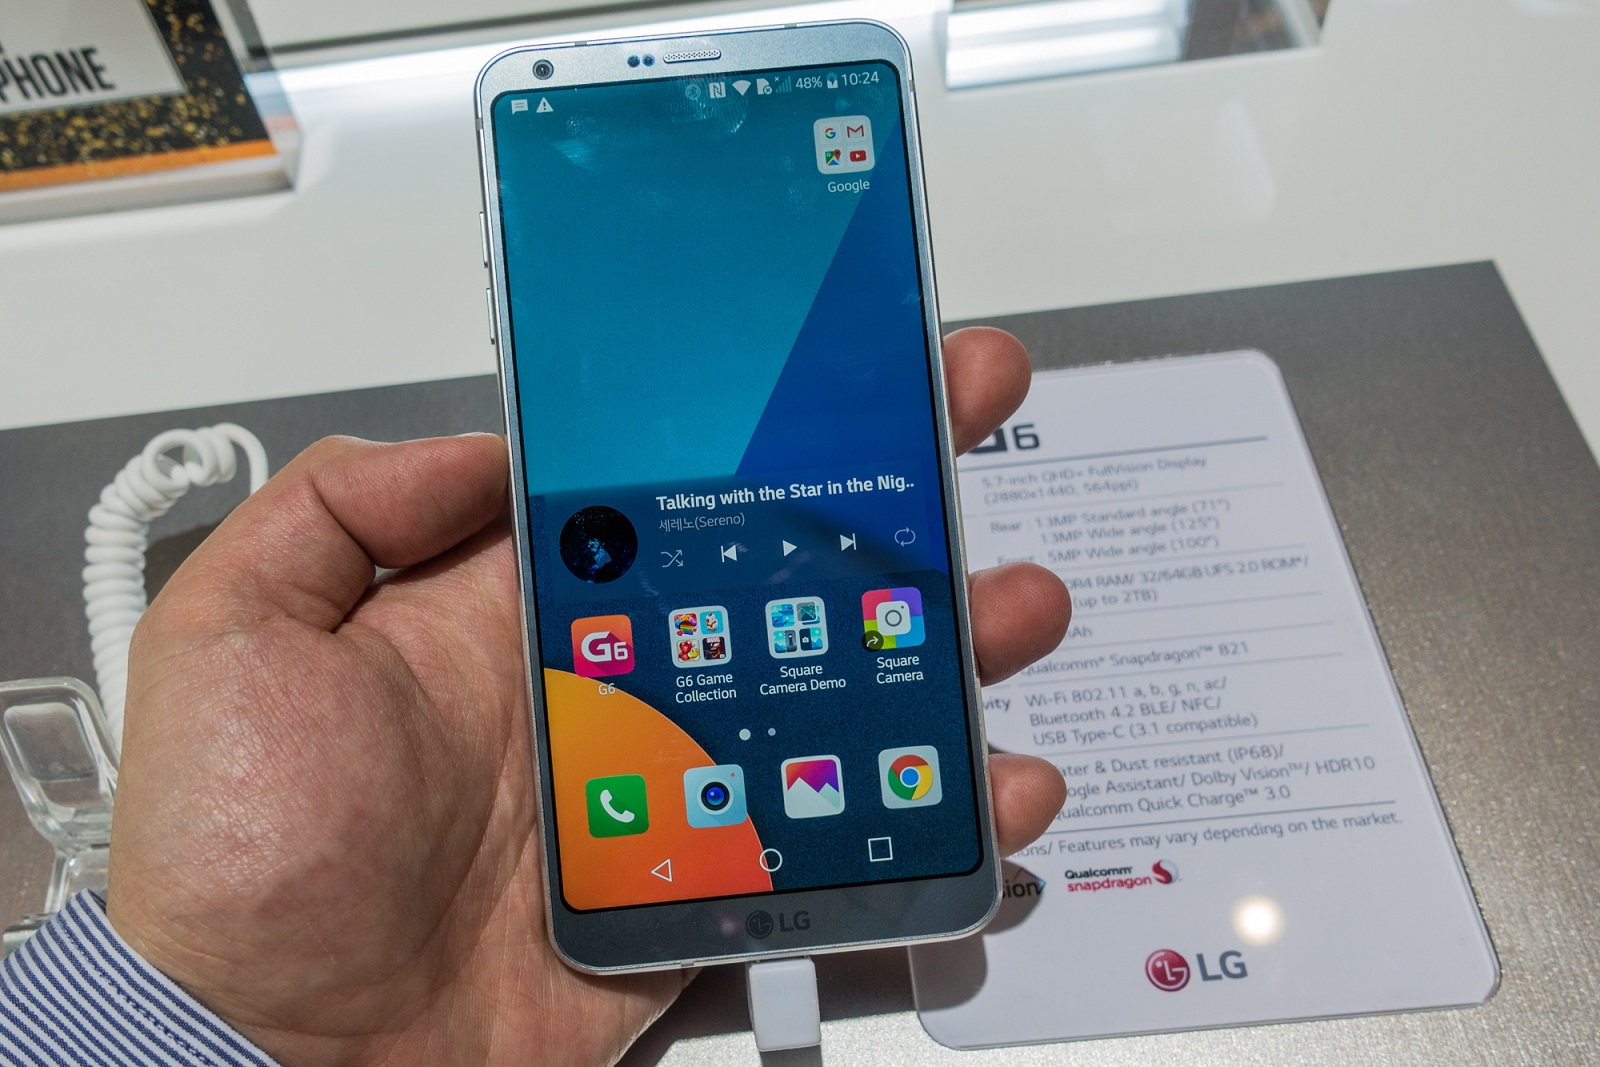 LG-G6-mwc